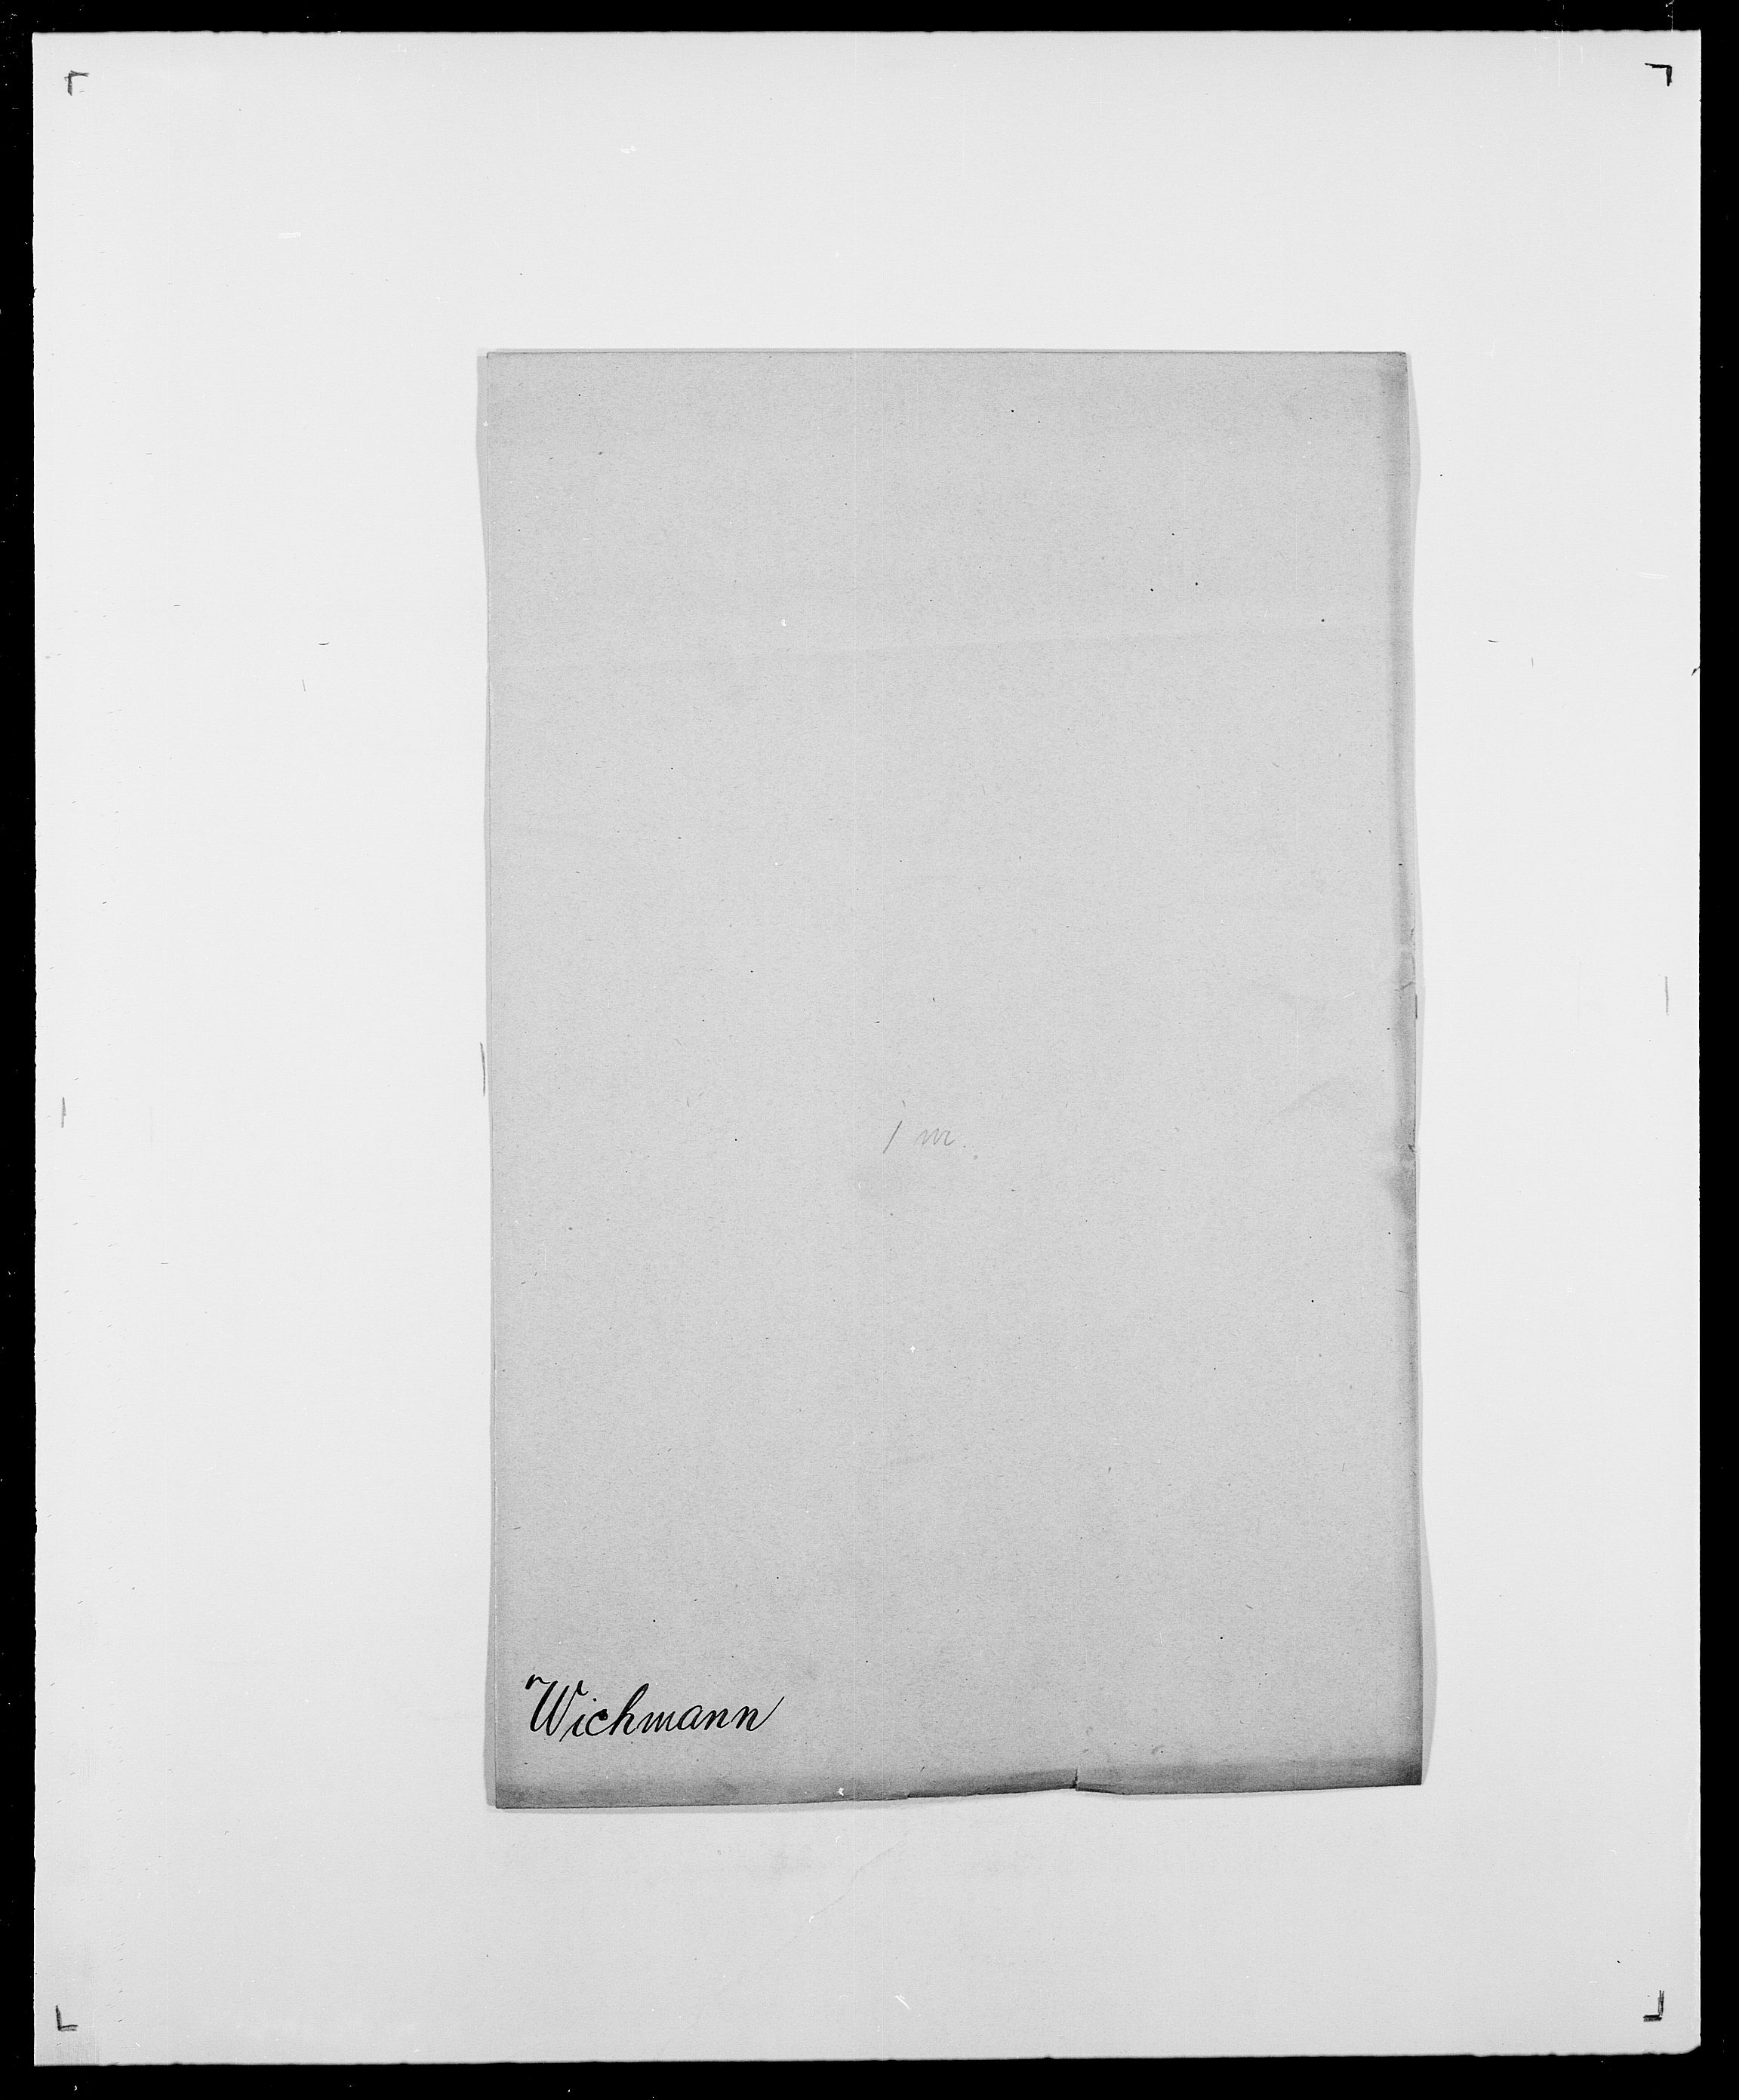 SAO, Delgobe, Charles Antoine - samling, D/Da/L0041: Vemmestad - Viker, s. 445